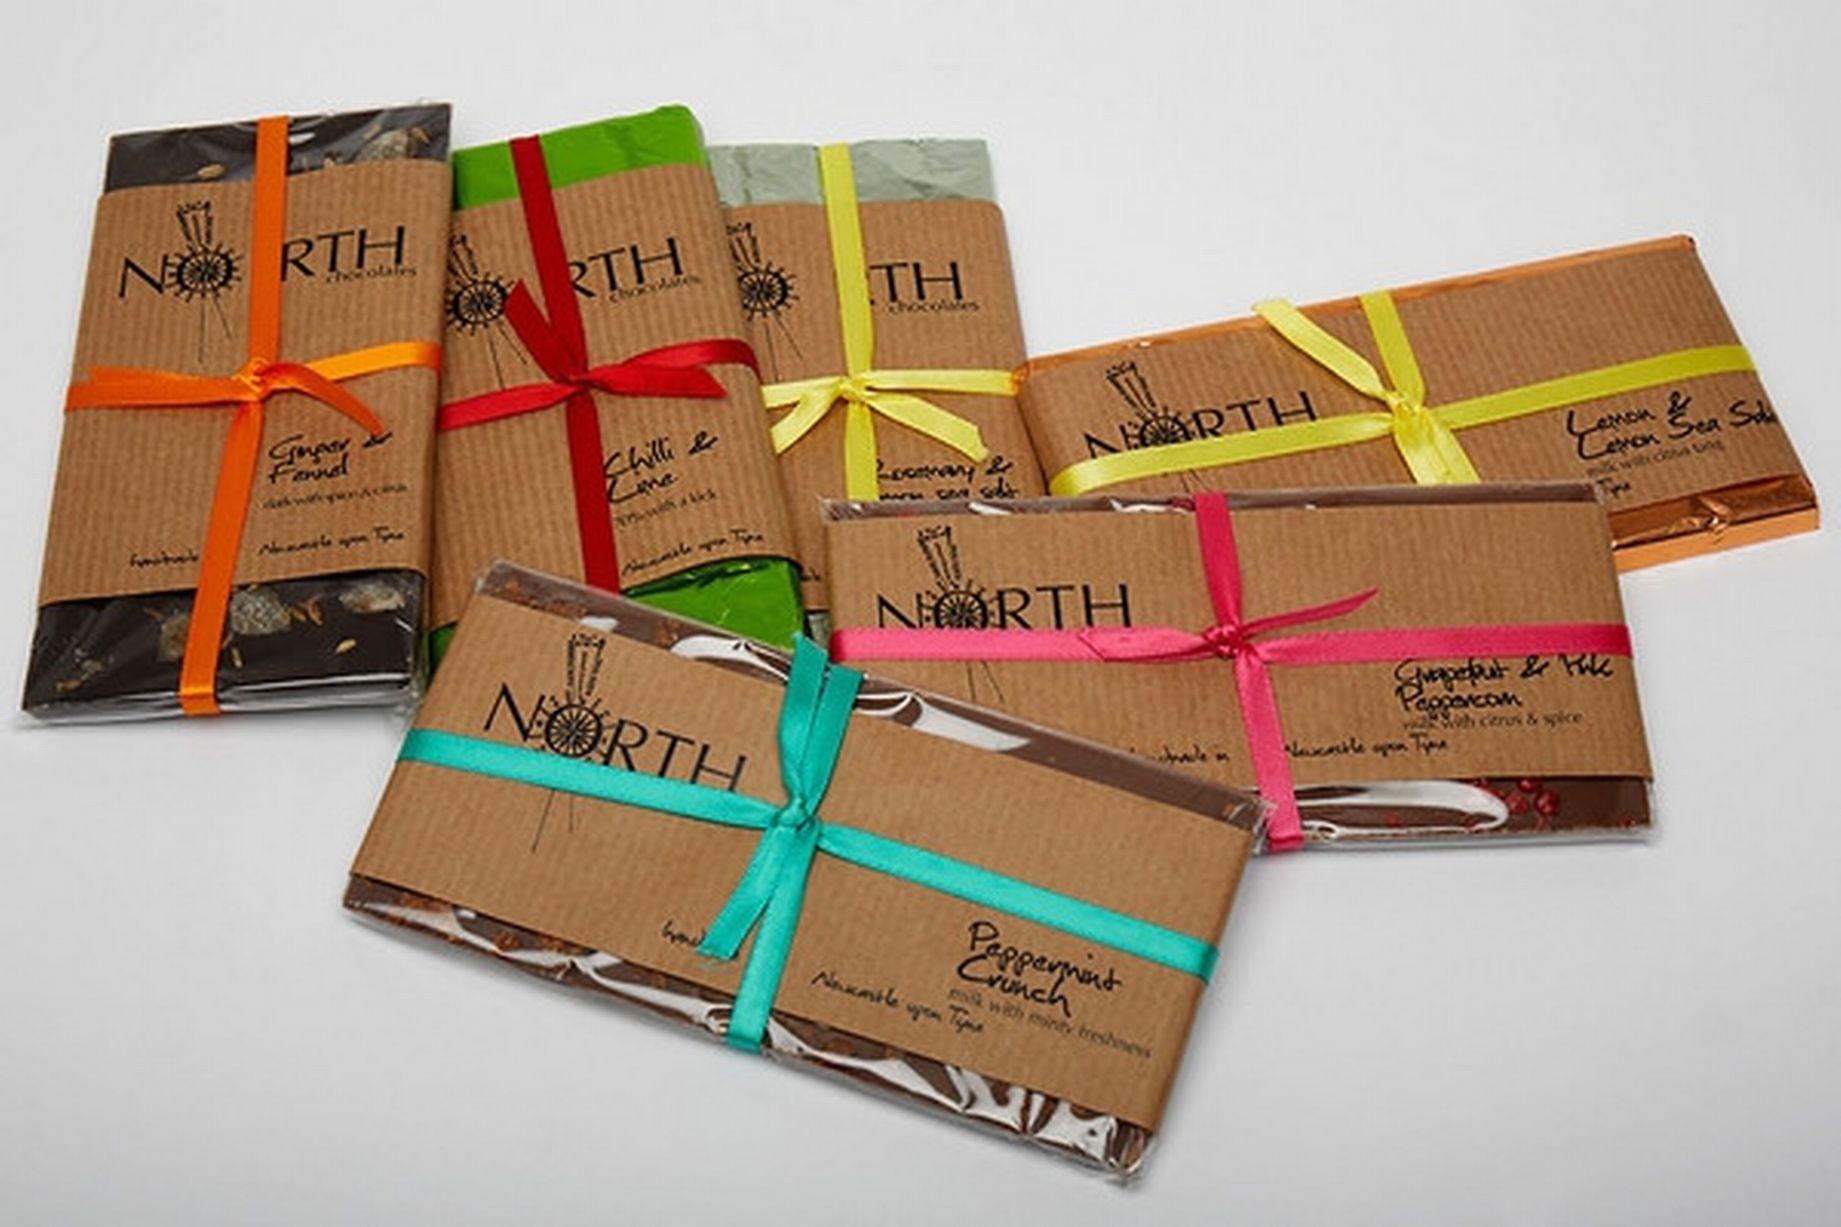 North Chocolate